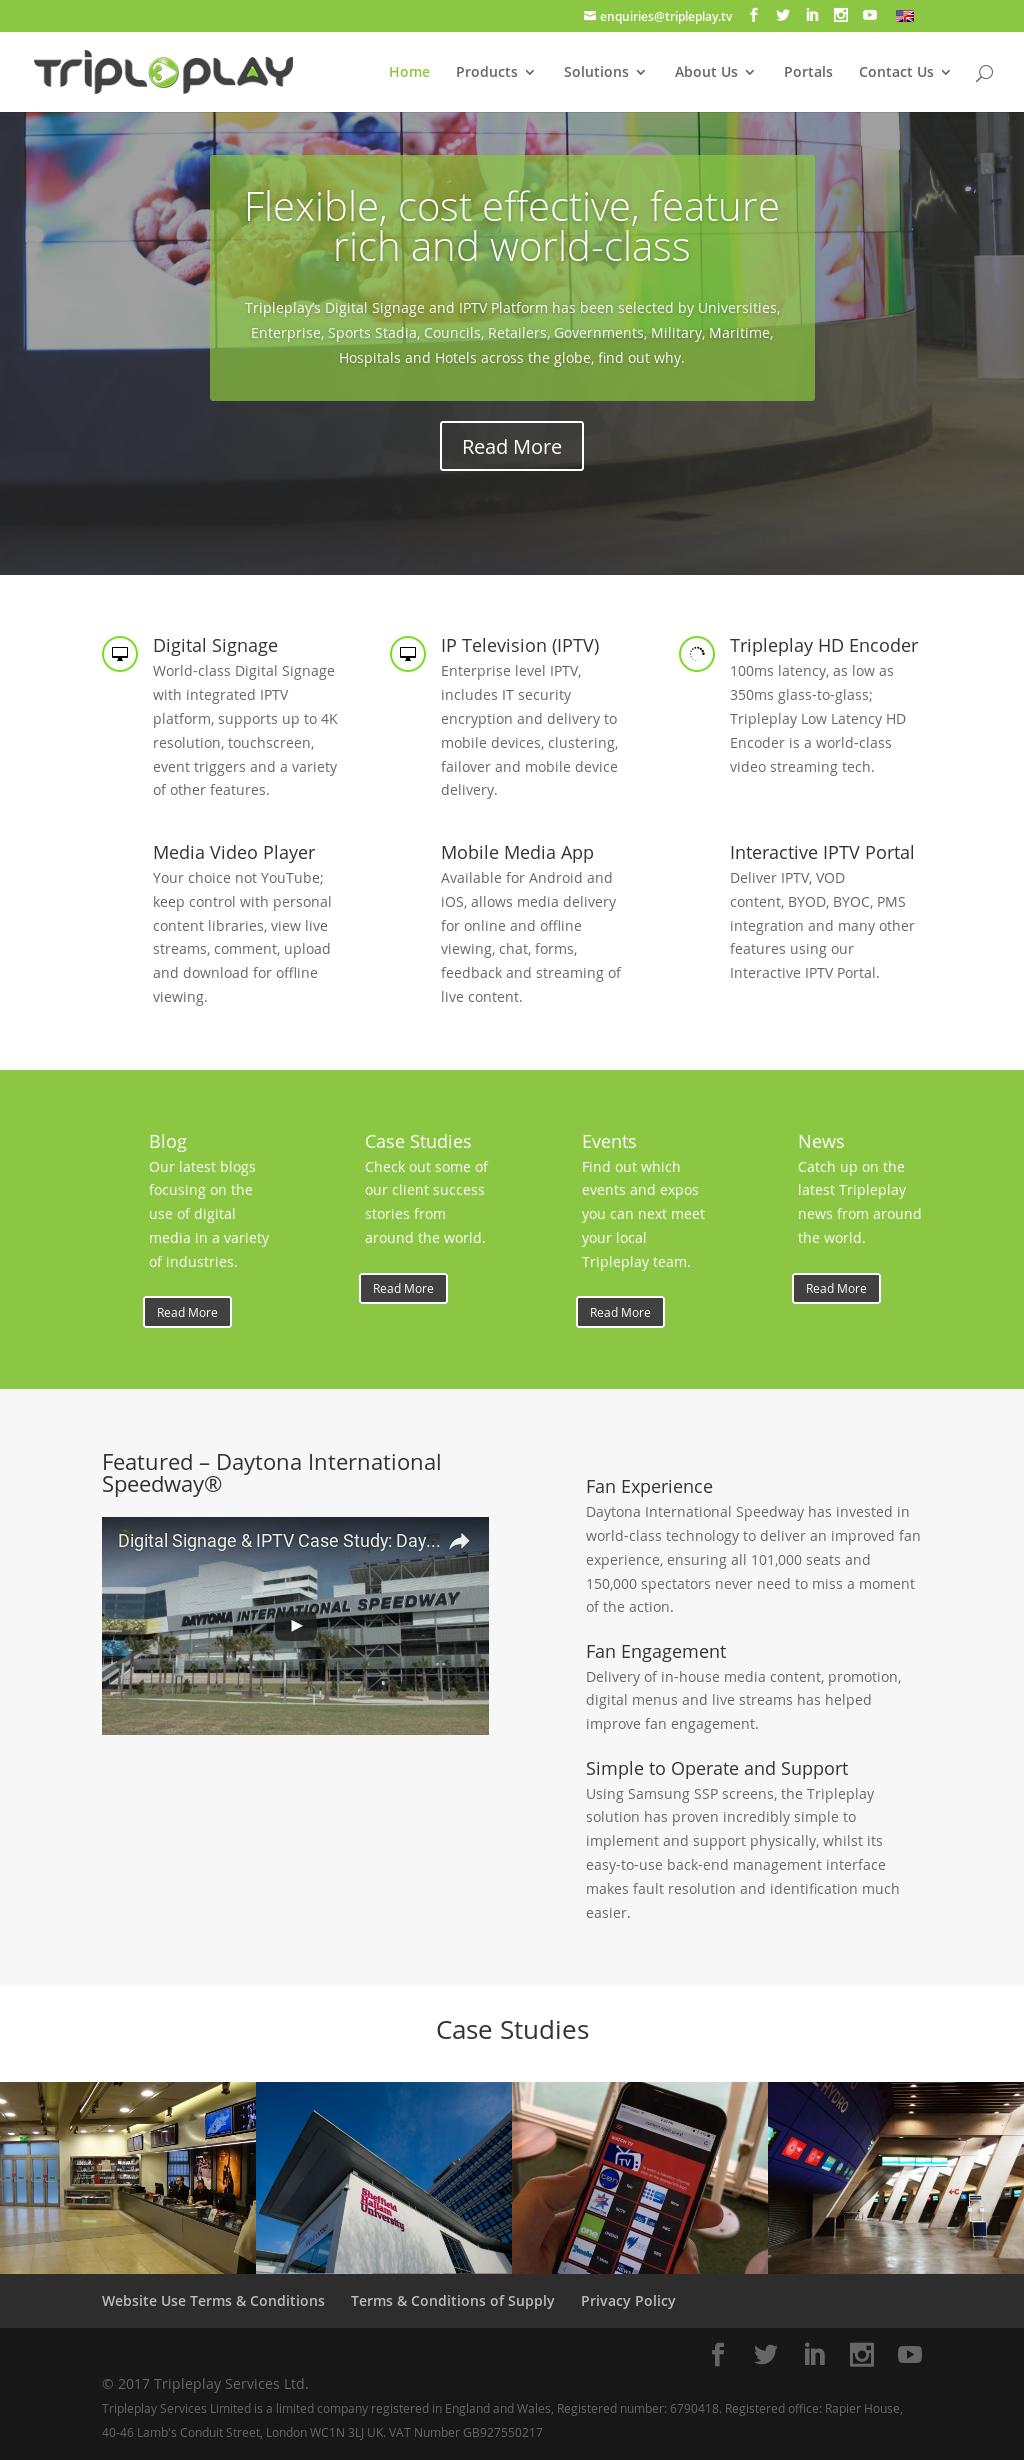 Tripleplay Services Ltd  Digital Signage, IPTV & Video Streaming